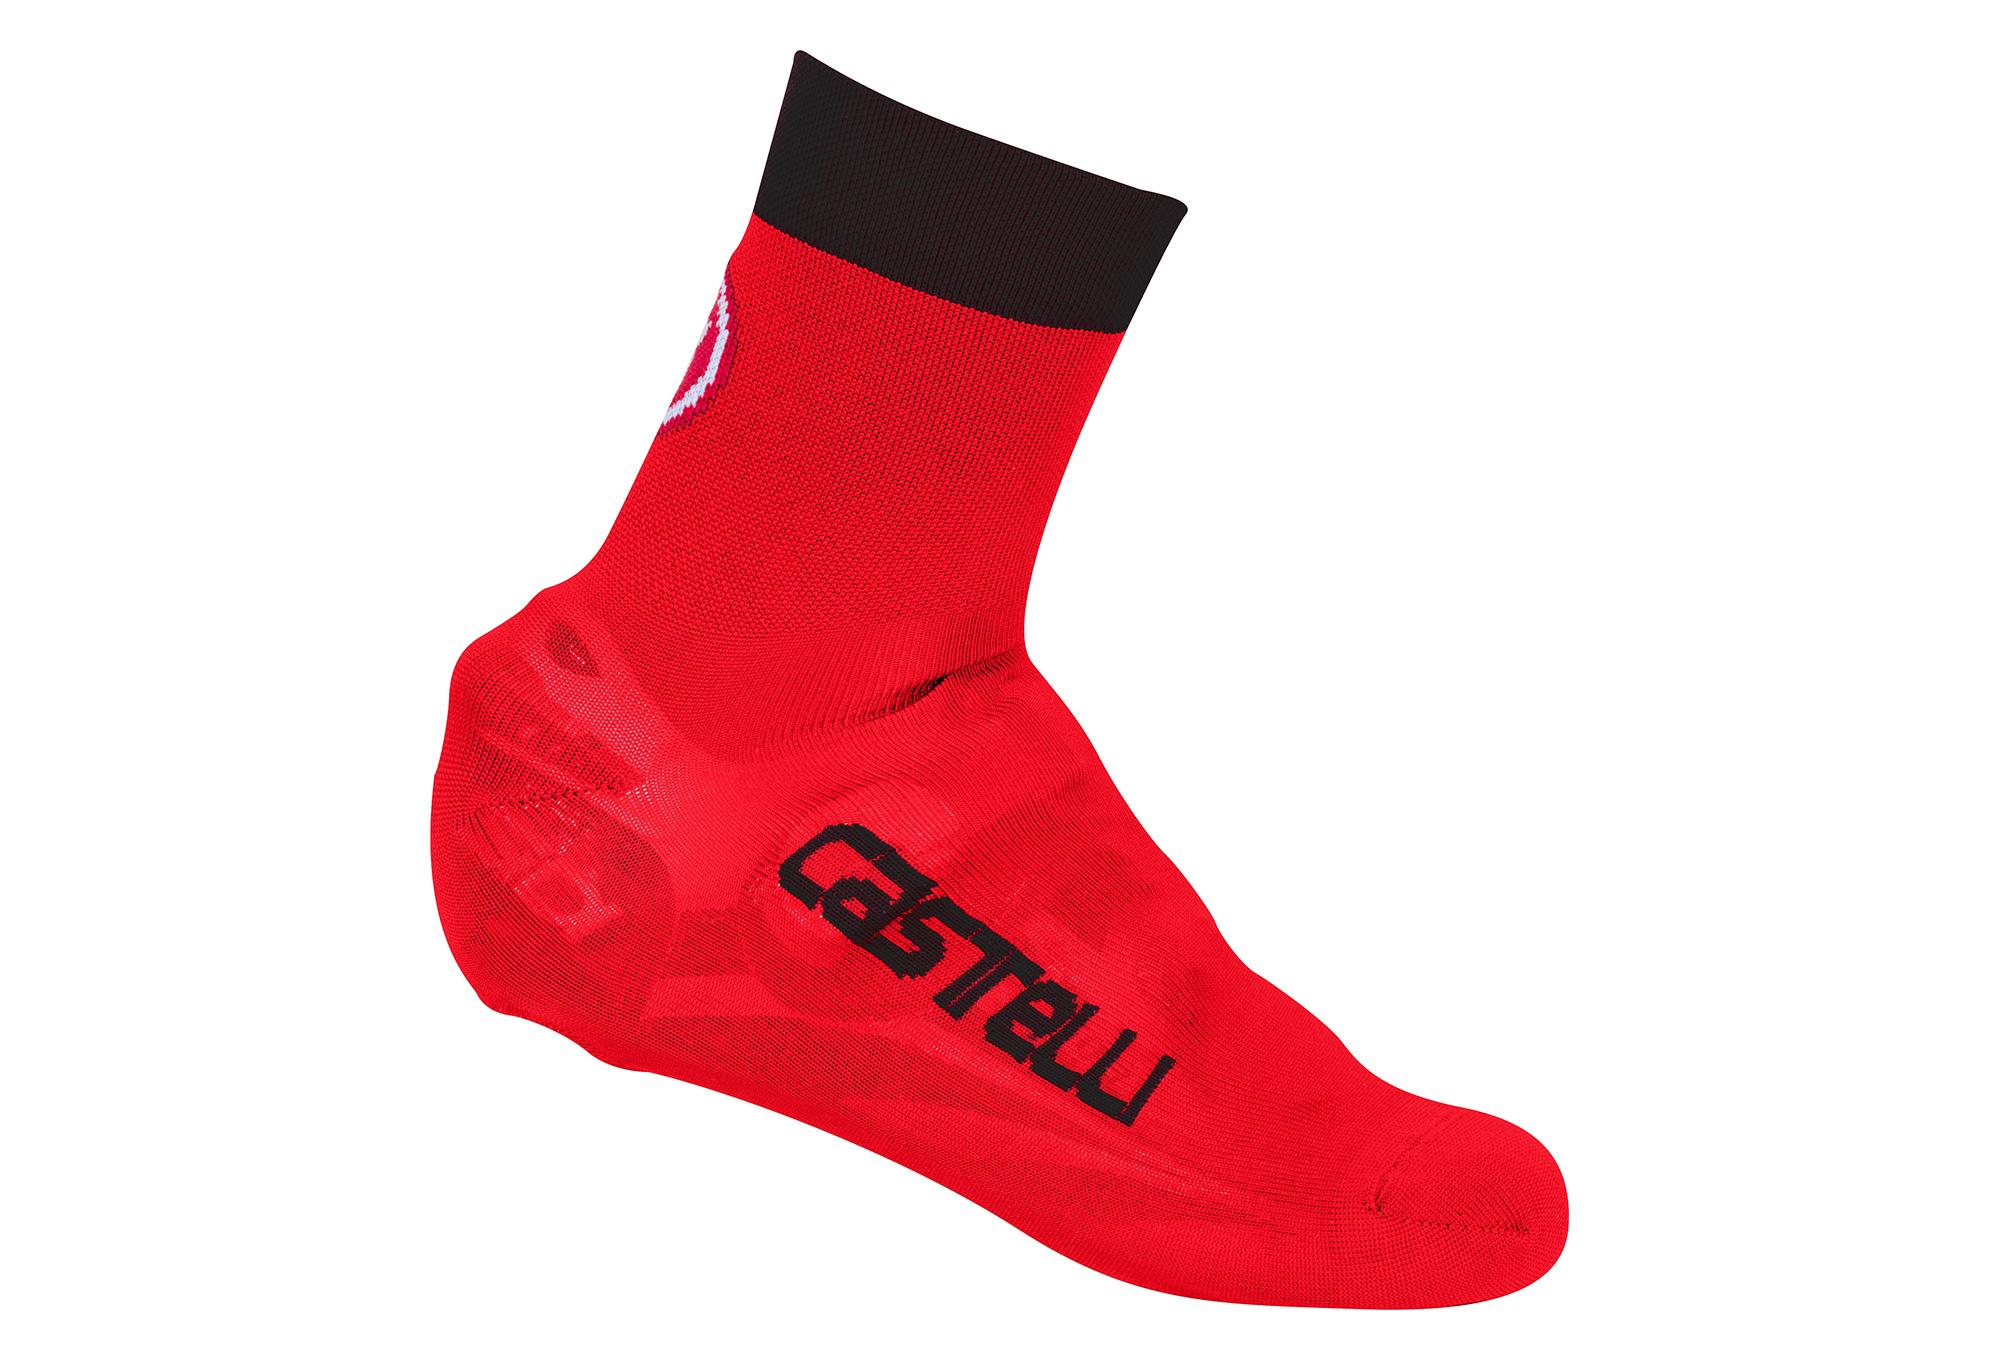 Castelli Belgian Bootie 5 Shoe Cover